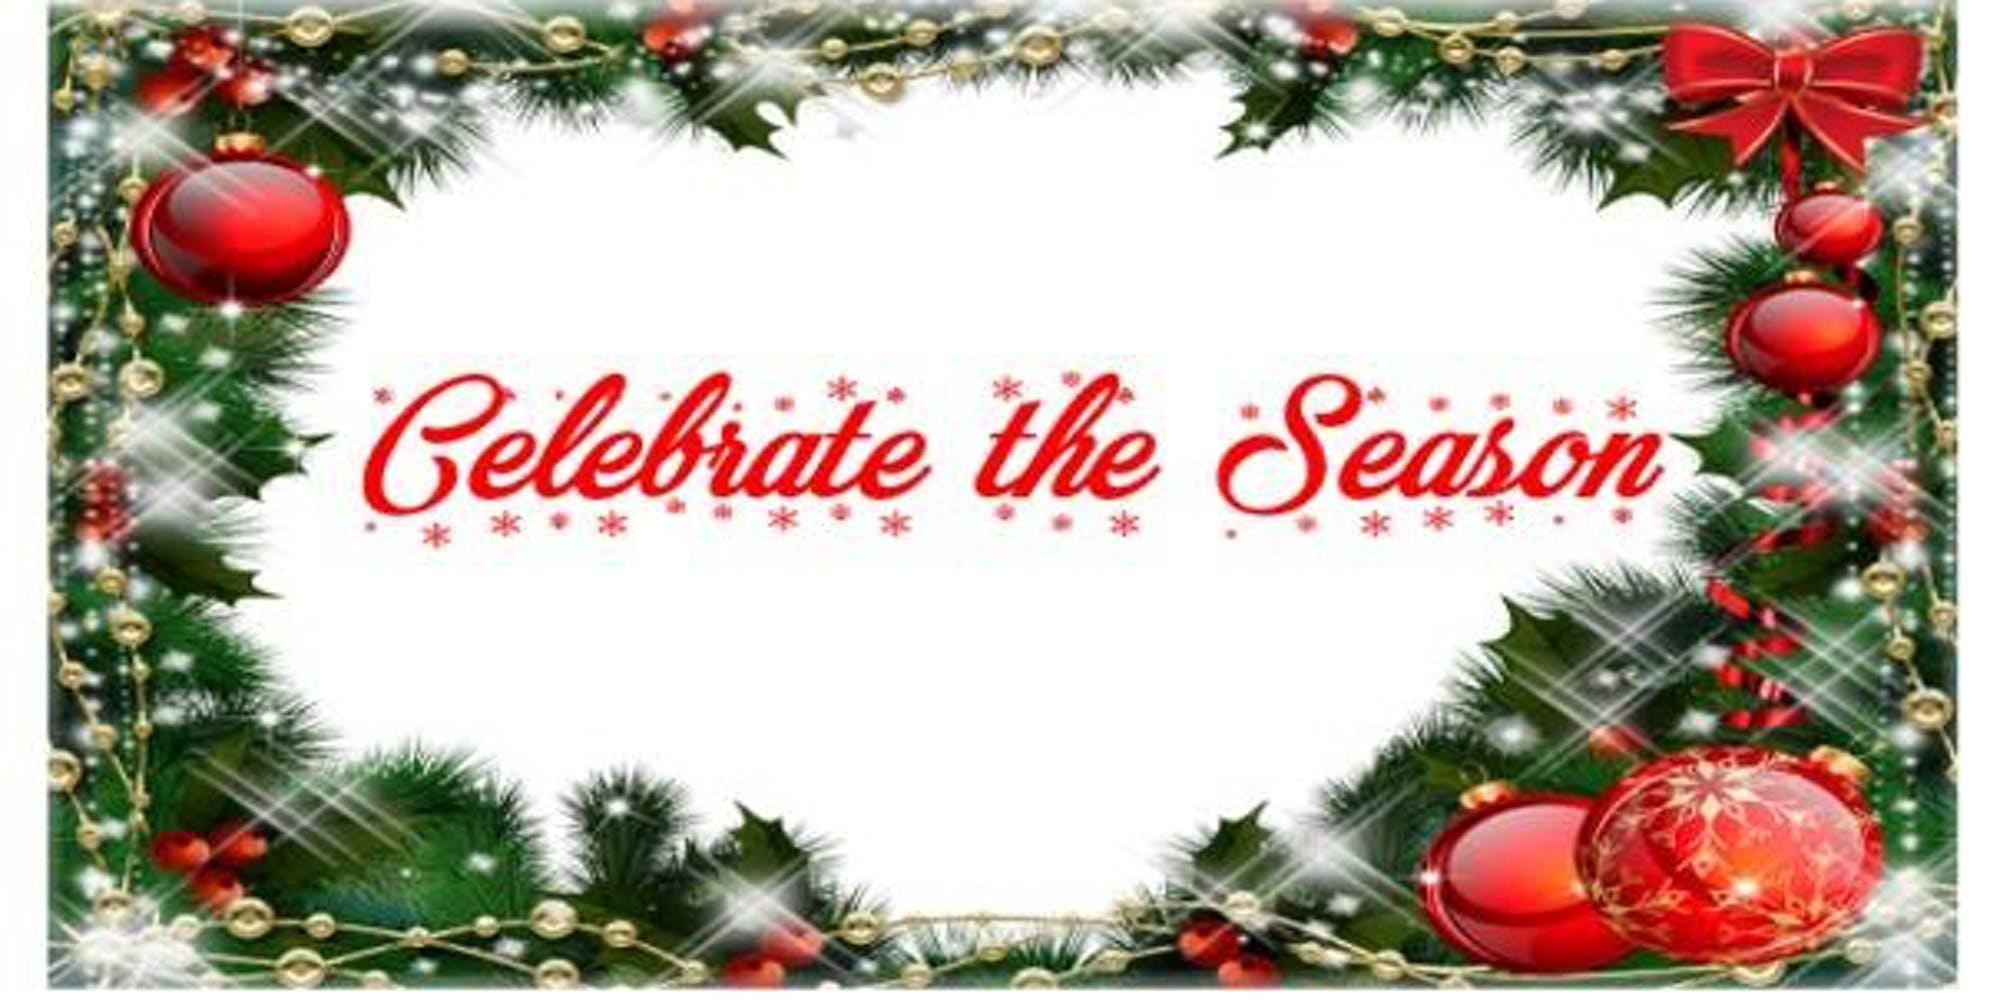 Ring Sarasota Announces Holiday Mini Tour